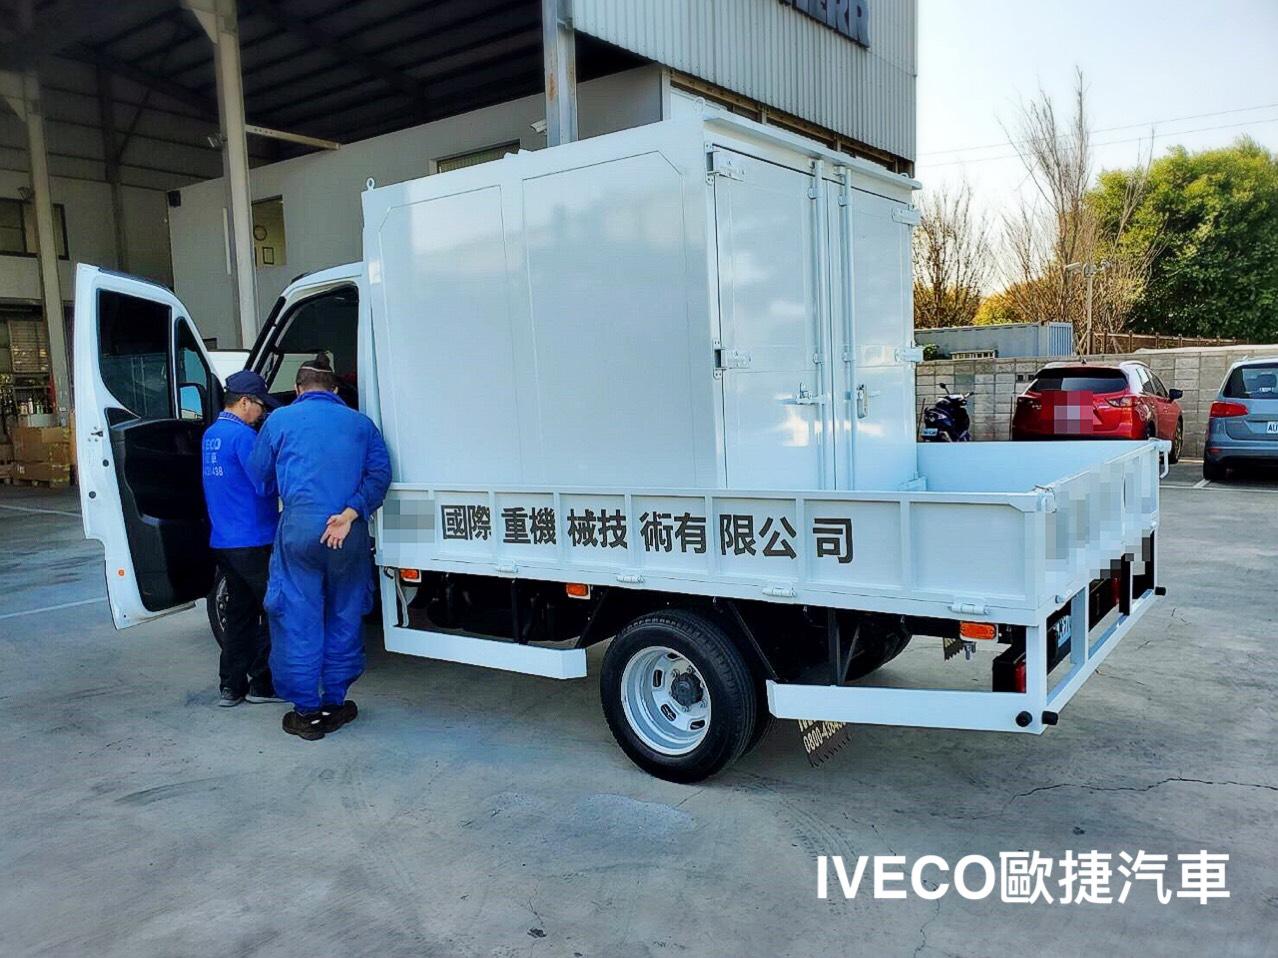 IVECO拖吊貨車改裝